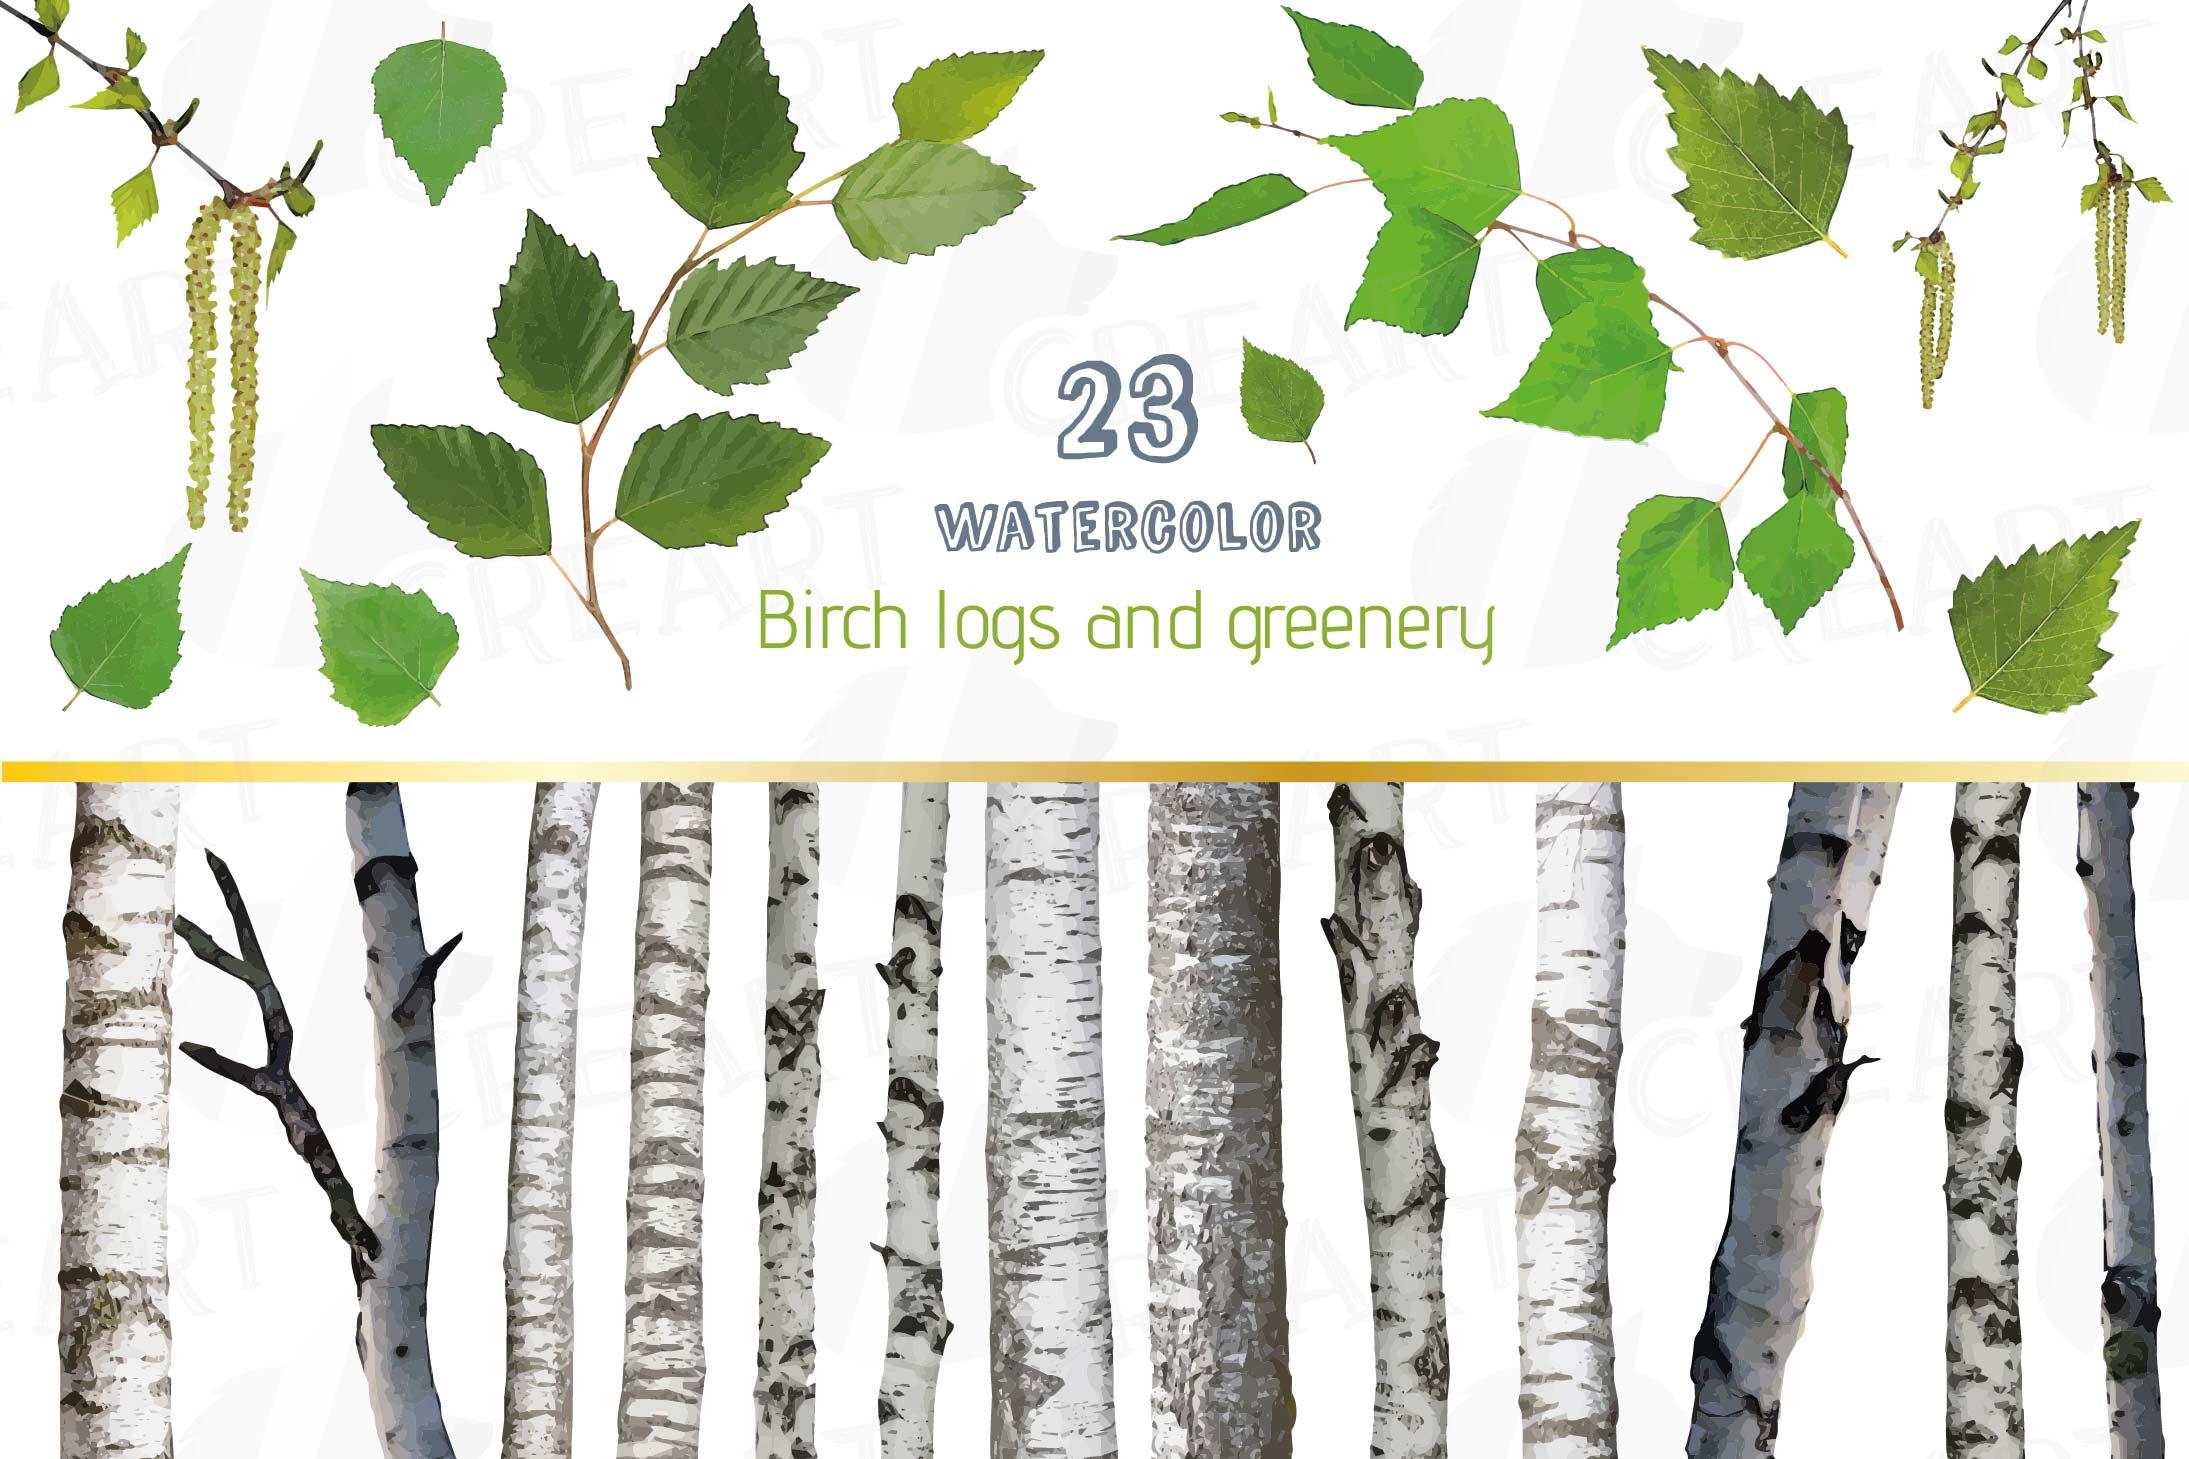 Watercolor Birch Tree Clip art, leaves greenery, trunk decor.